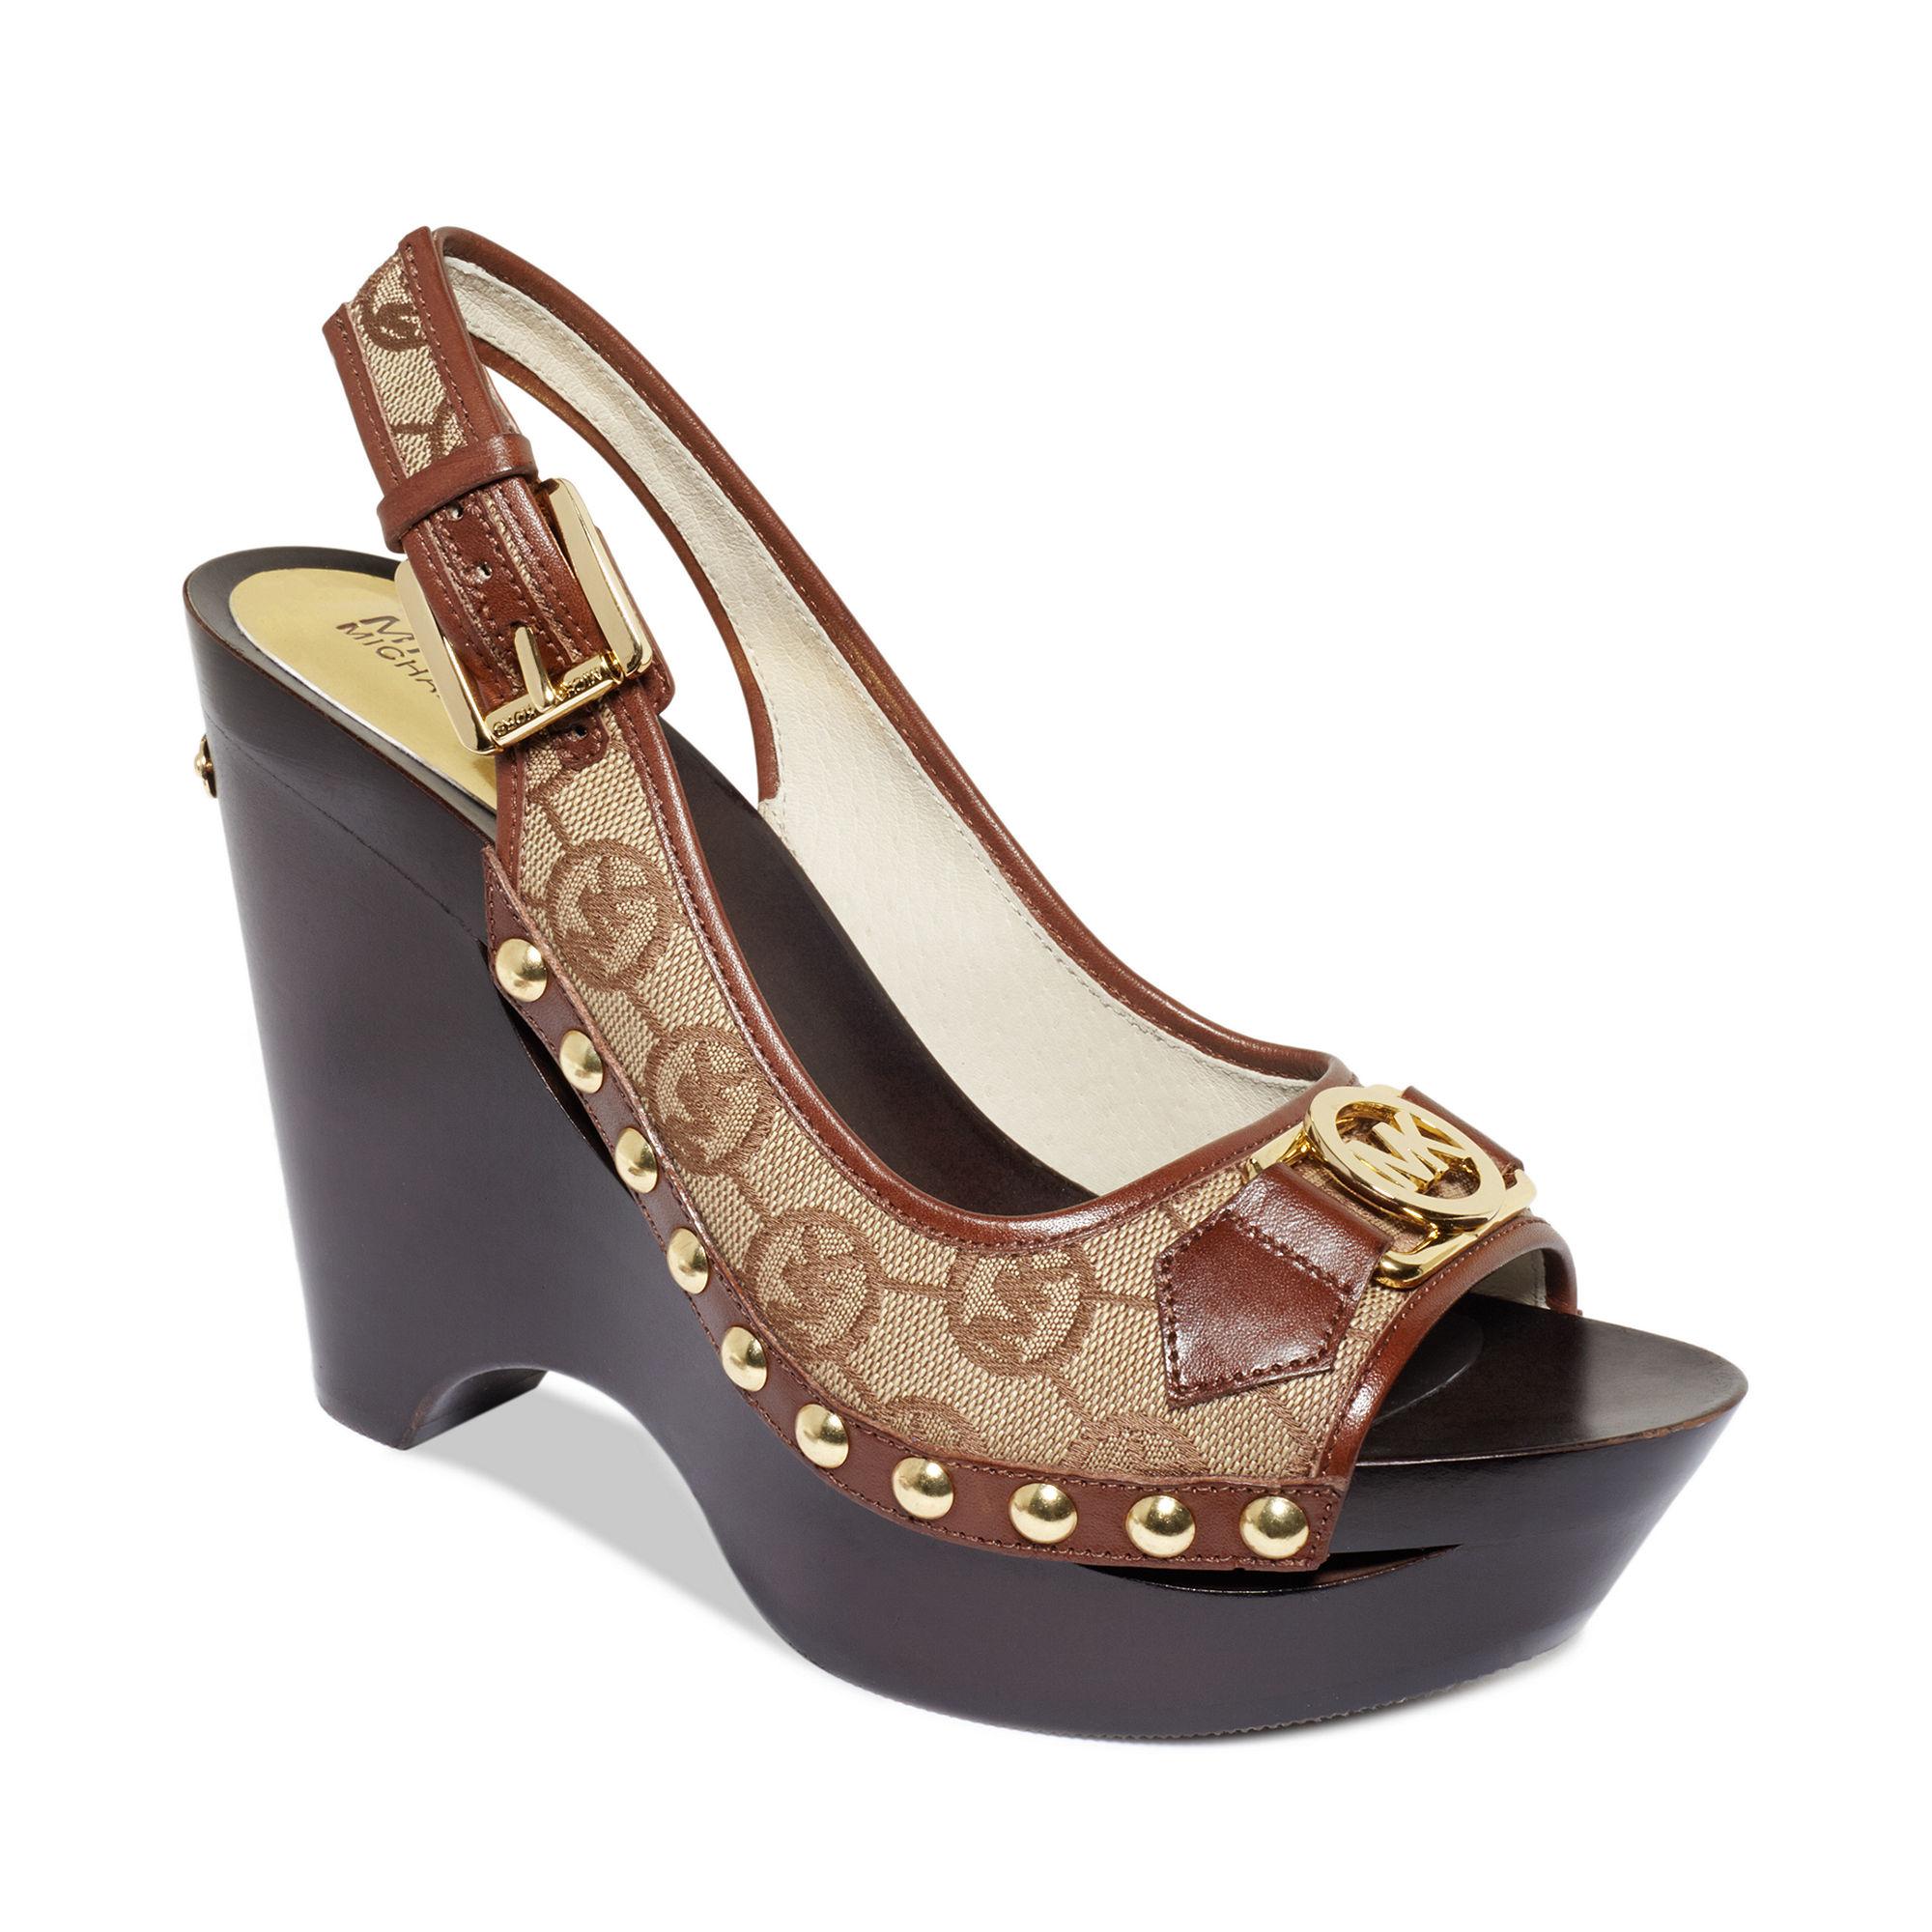 Lyst Michael Kors Charm Platform Wedge Sandals In Black